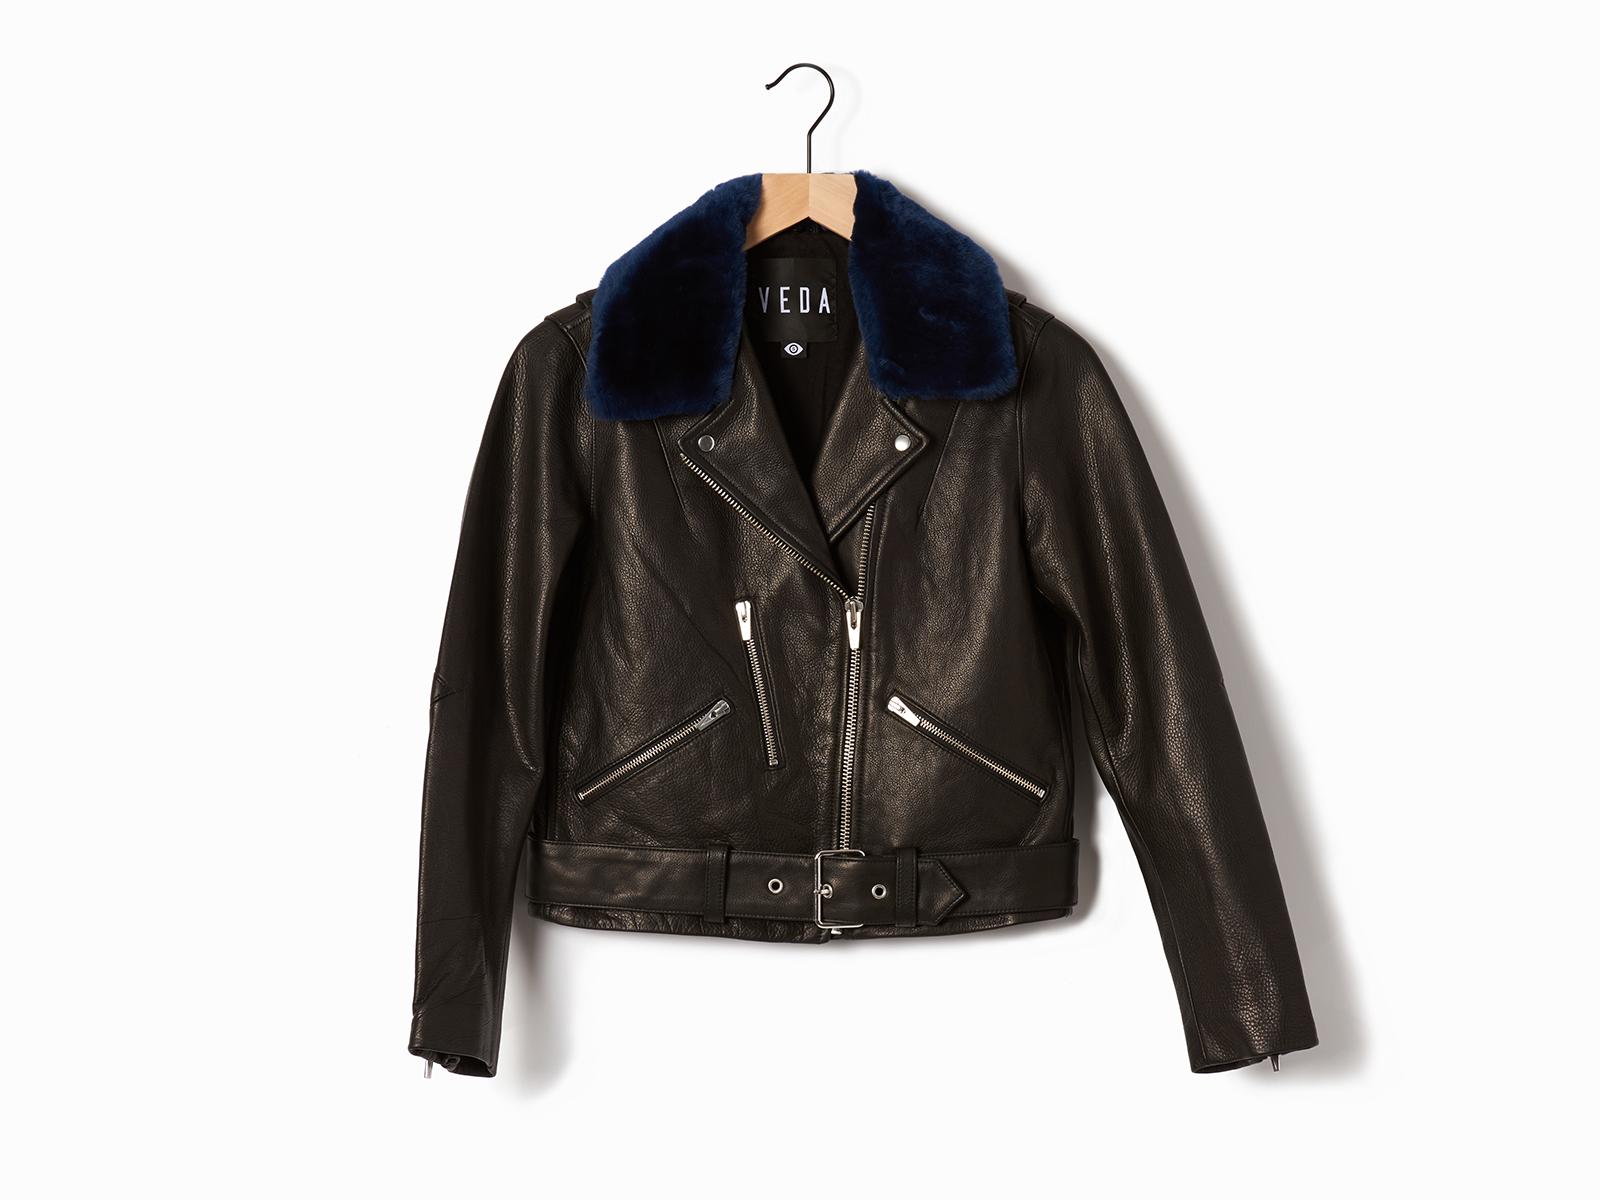 French_Italian_Veda_National_Leather_Jacket_Black_Blue_01.jpg